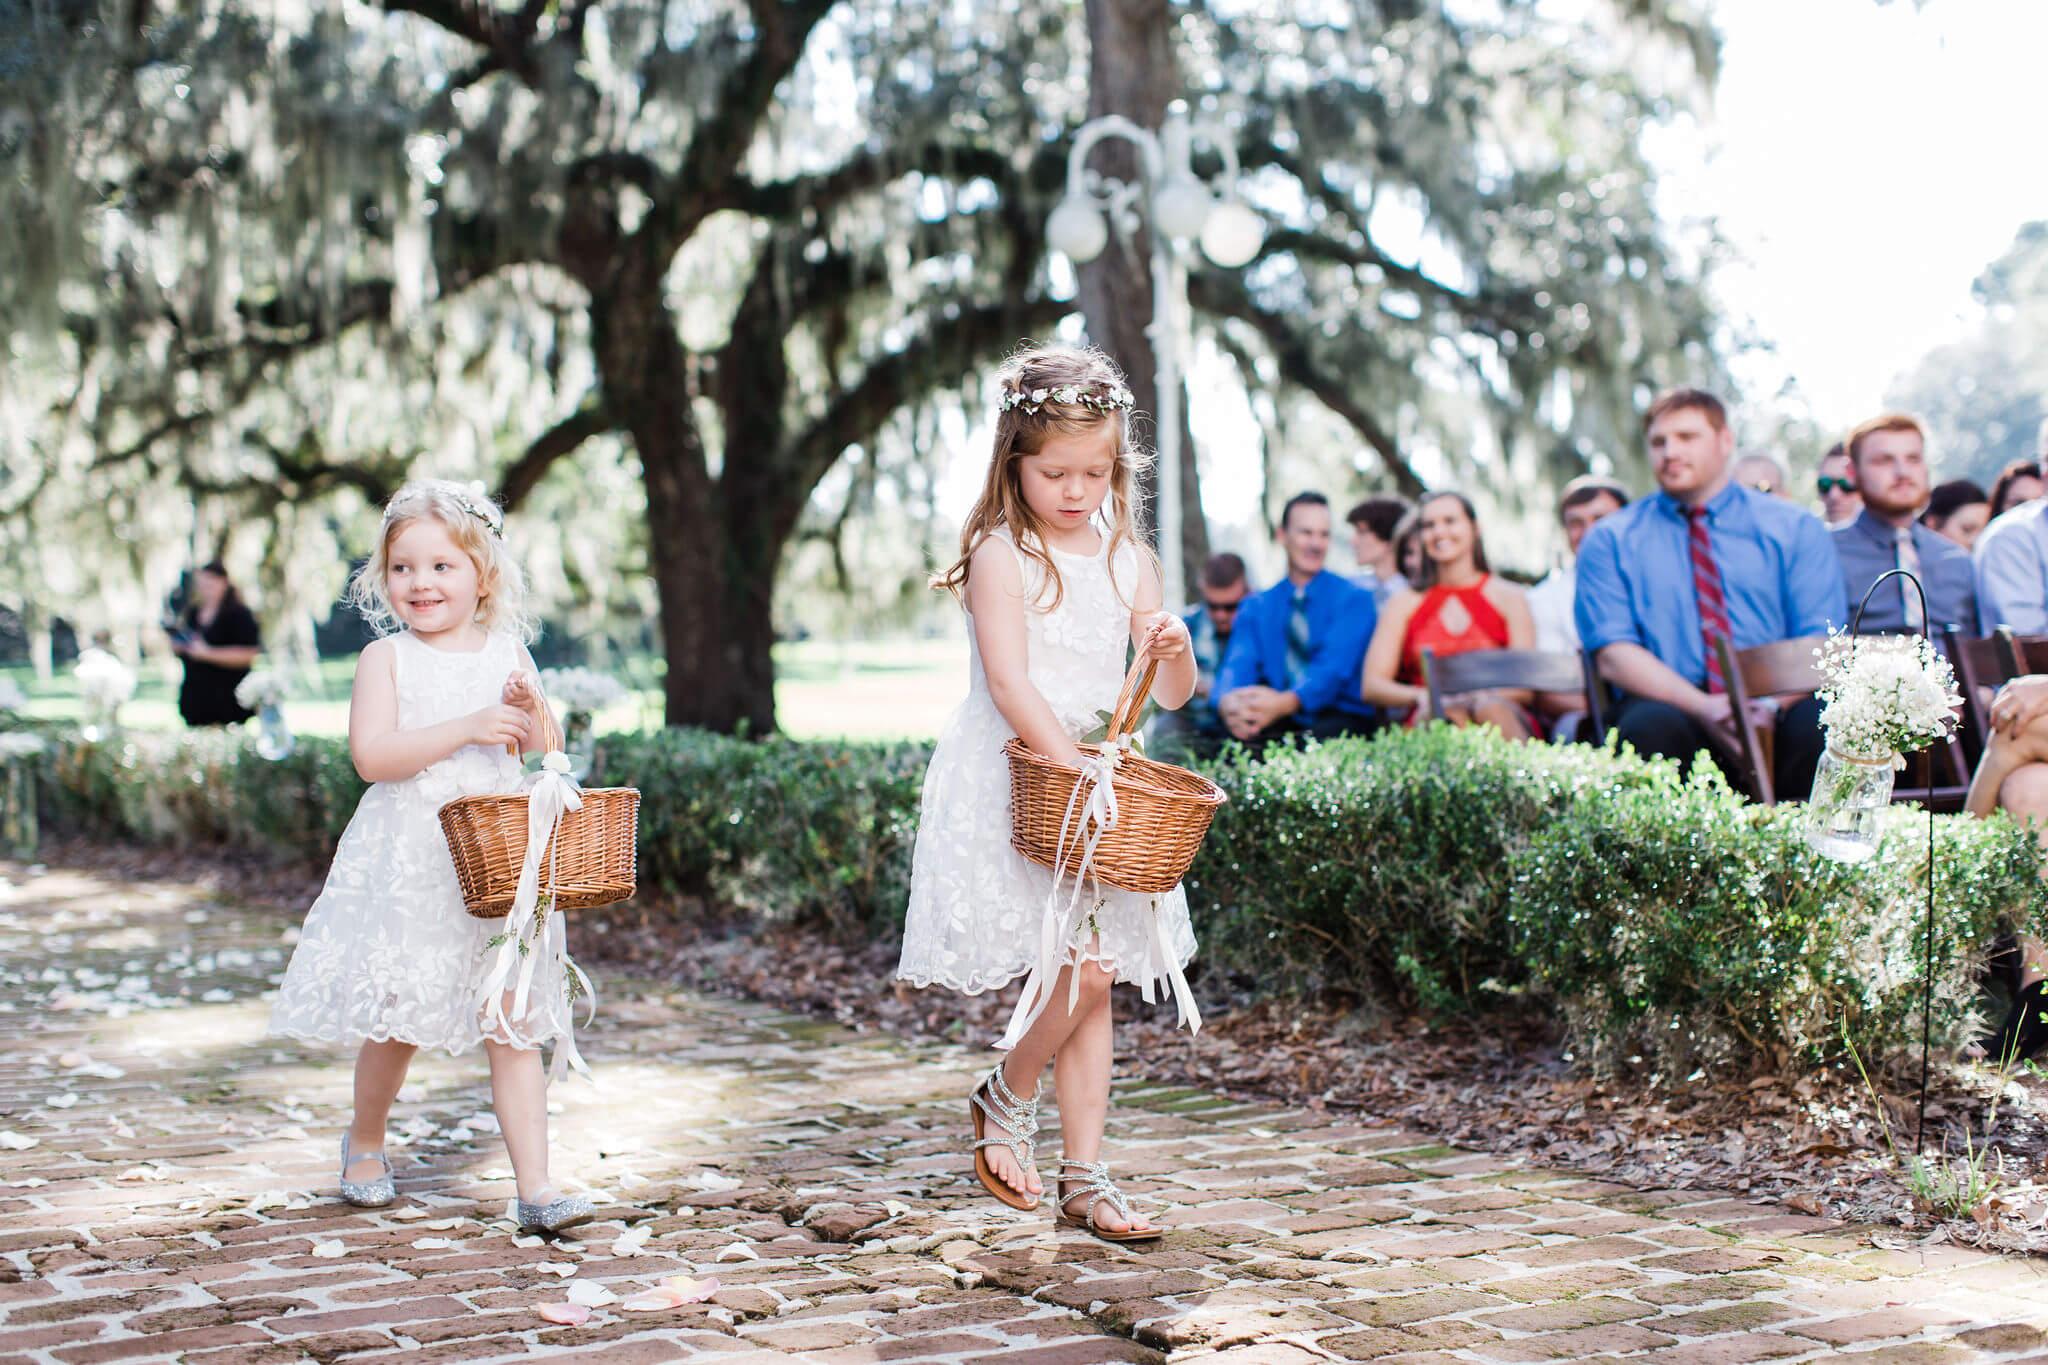 apt-b-photography-savannah-wedding-photographer-savannah-wedding-charleston-wedding-photographer-75.JPG